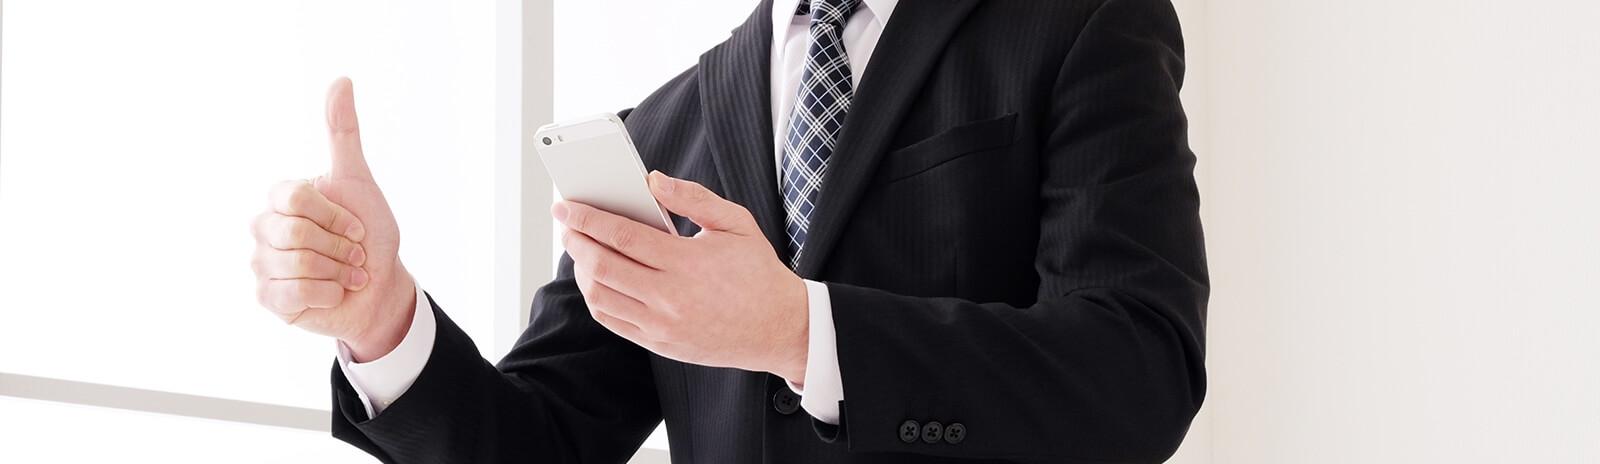 iPhoneのバッテリー交換修理保証サービス